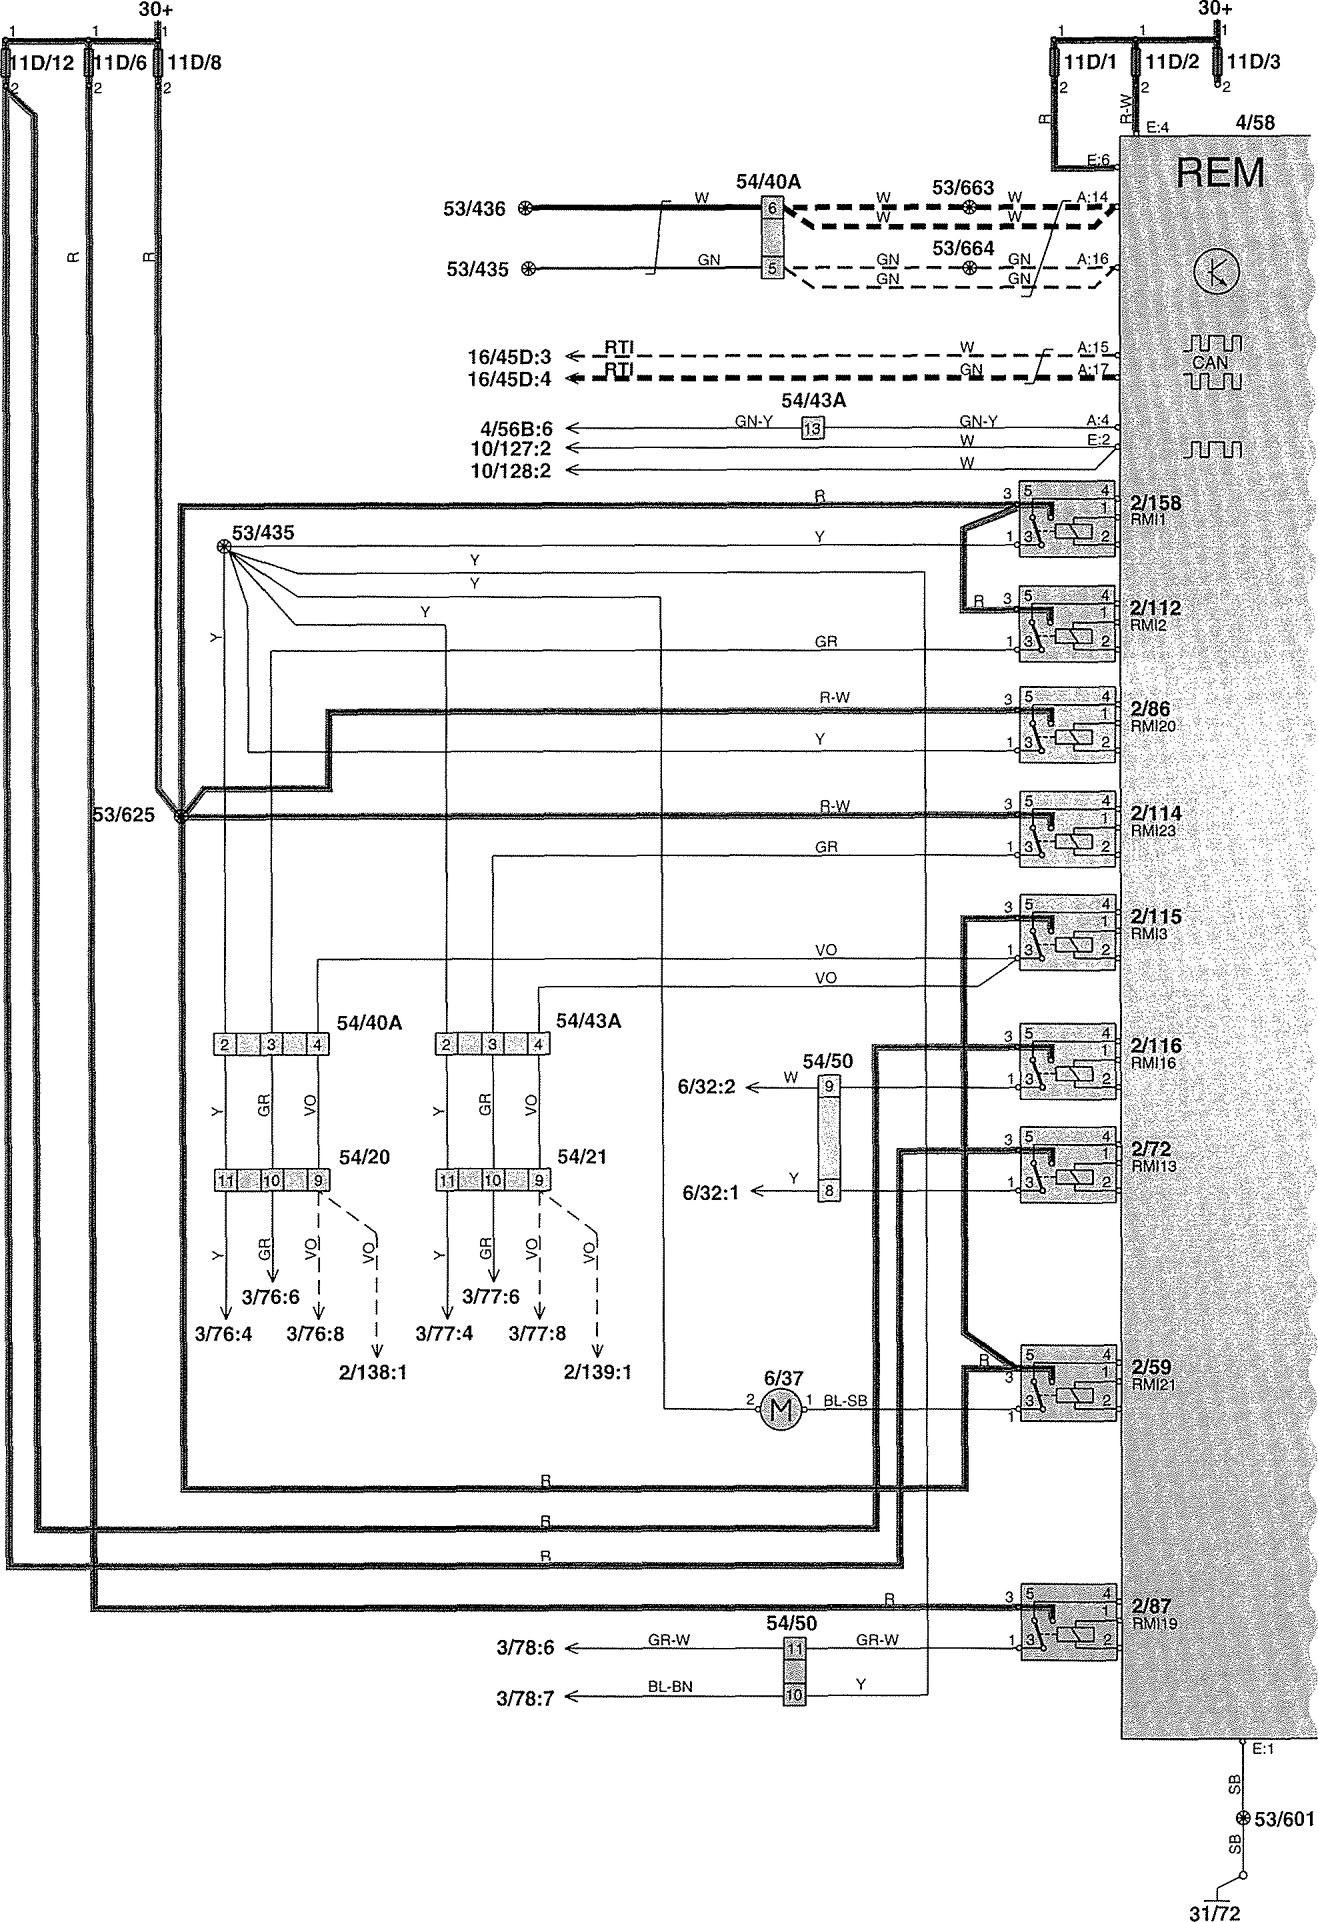 Diagram Ford Mustang Radio Wiring Diagram Acdelco Alternator Wiring